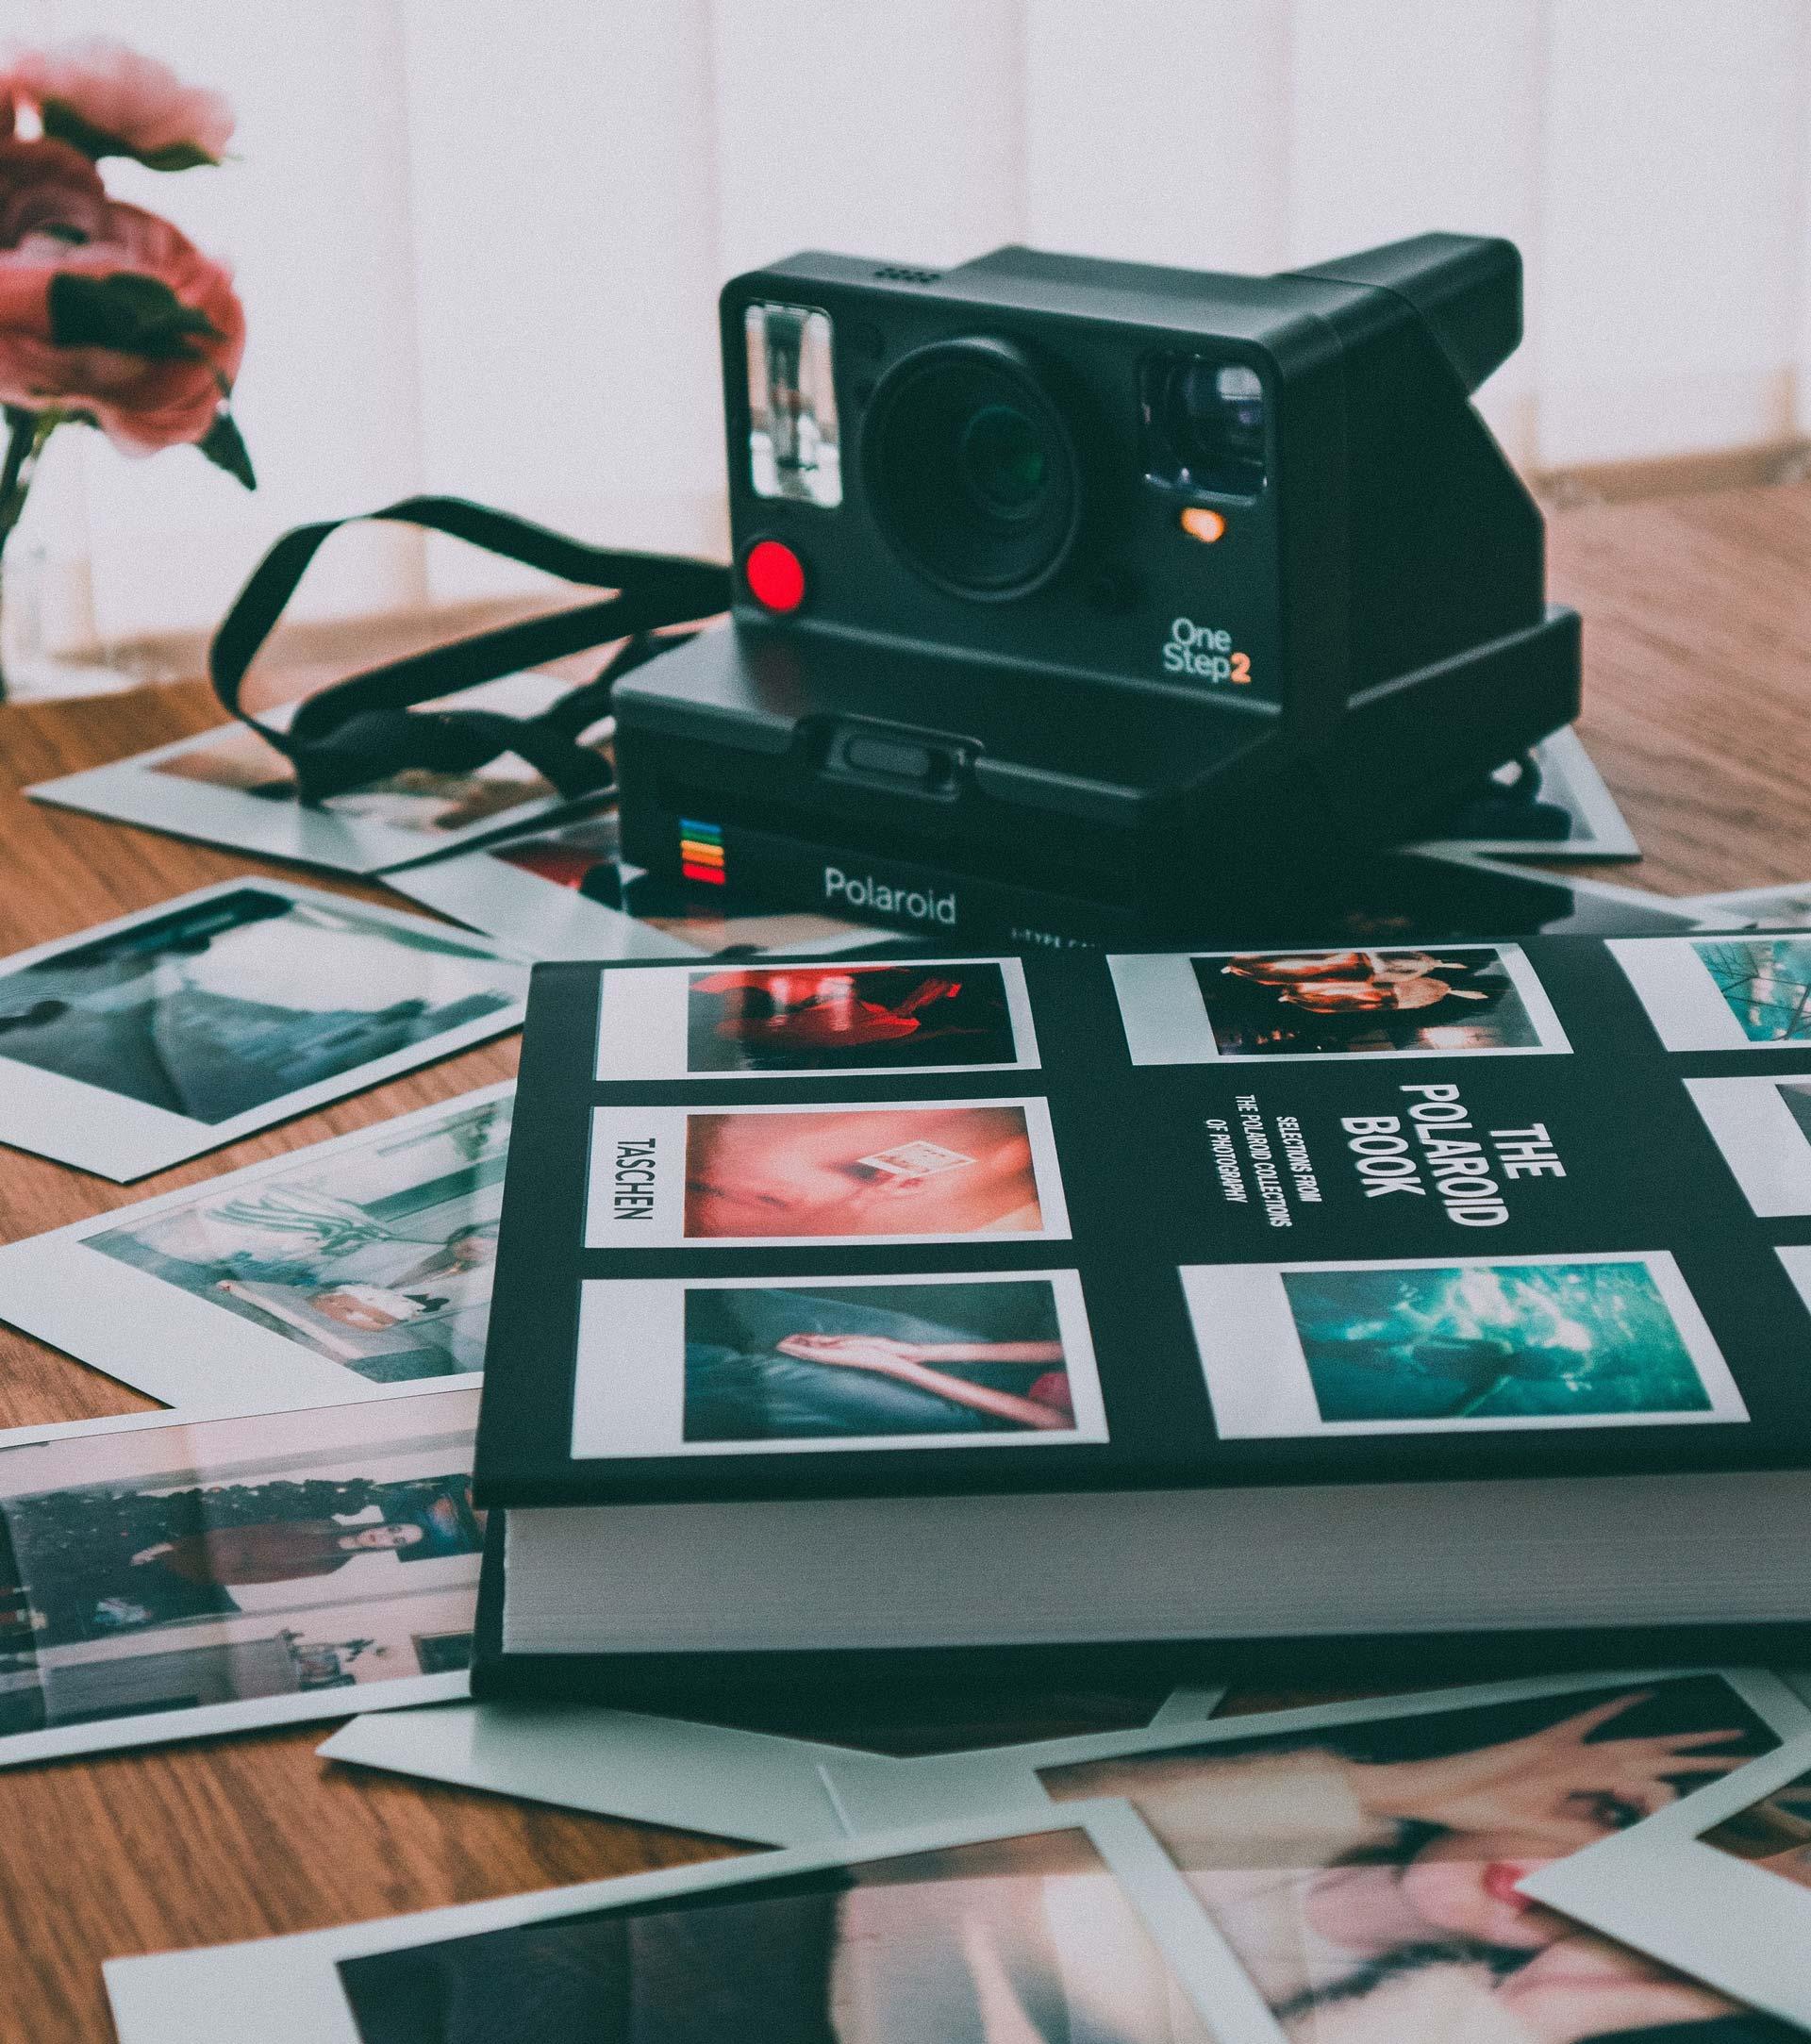 ideas-de-regalos-polaroid